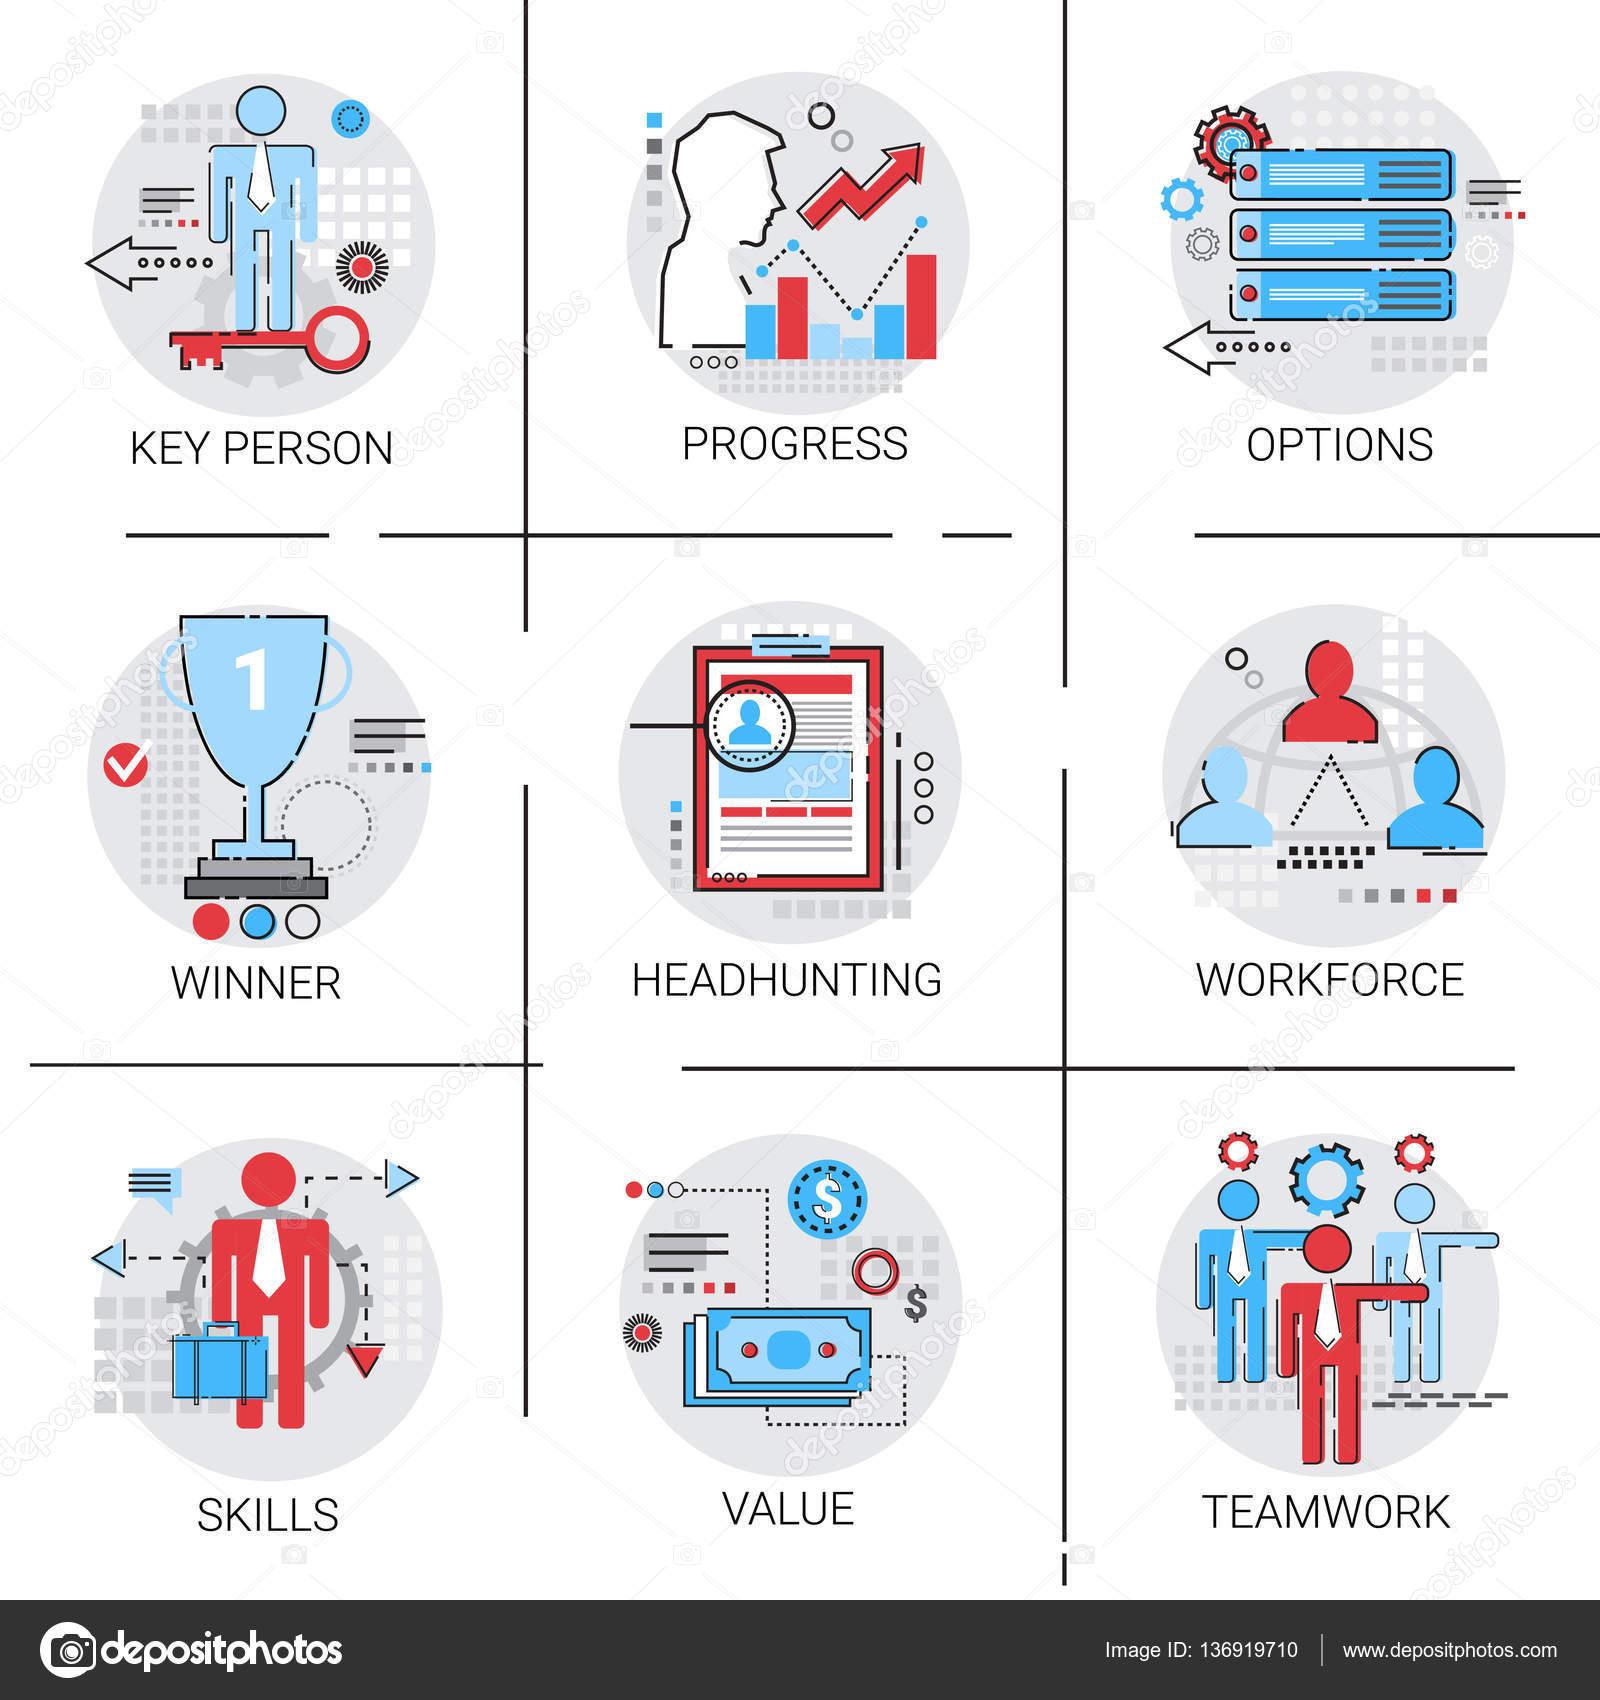 work skills icon set stock vectors royalty work skills icon work force management business team leadership icon set progress skills headhunting stock vector